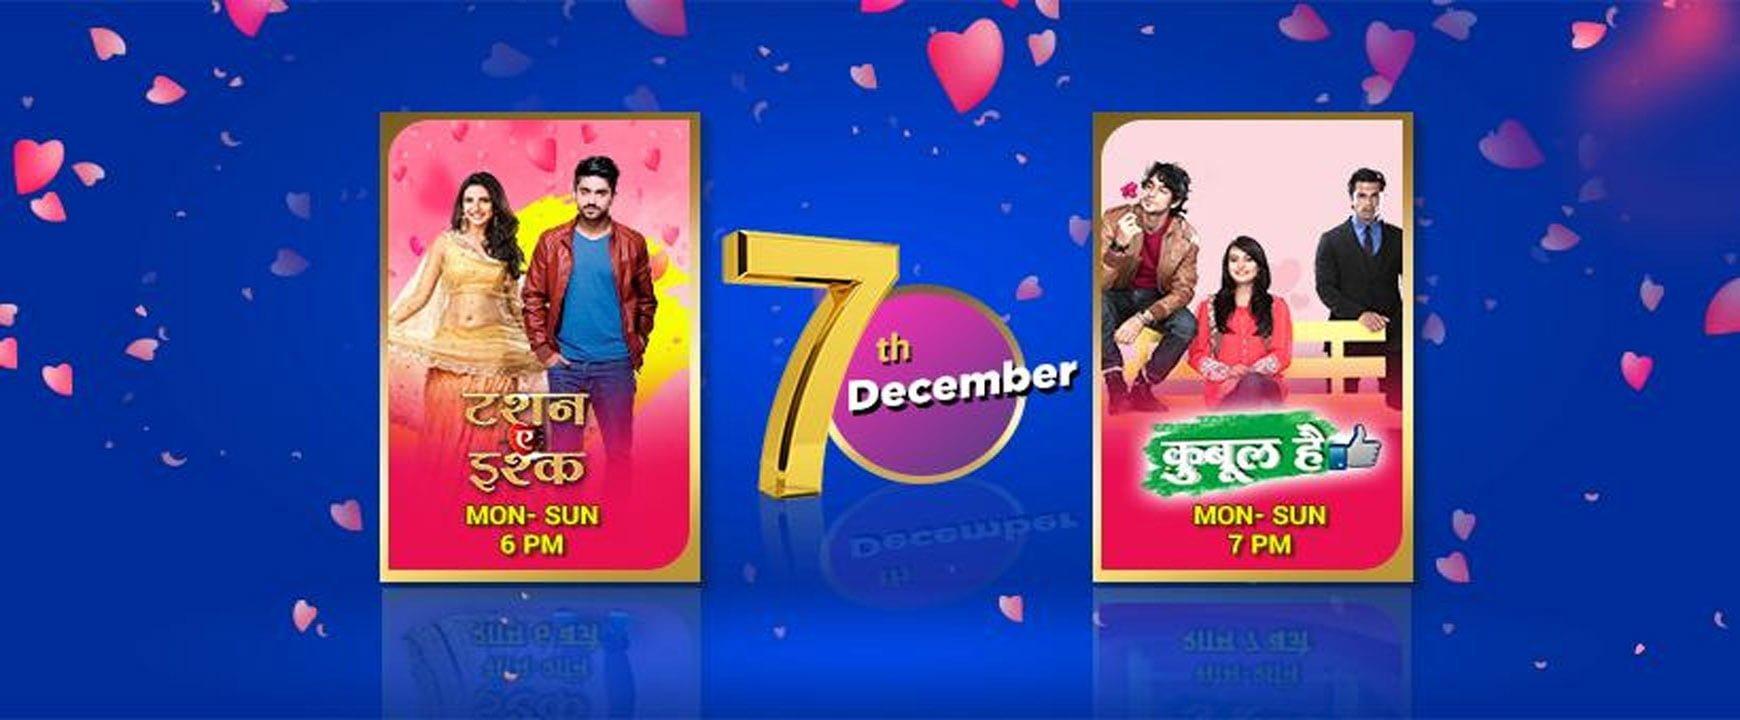 Big Ganga December Shows